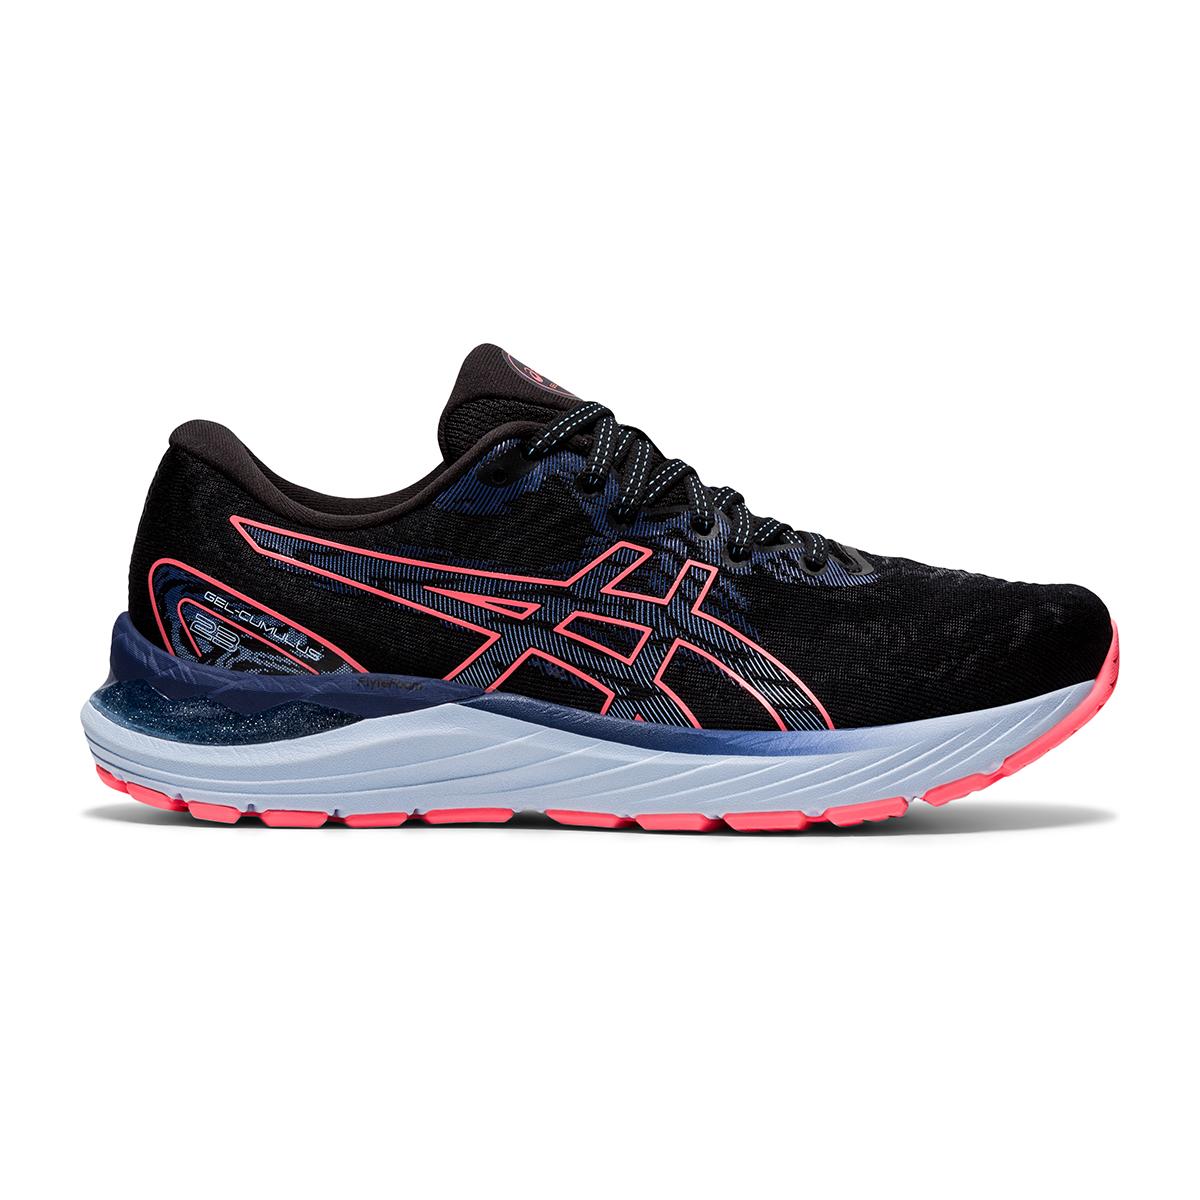 Women's Asics Gel-Cumulus 23 Running Shoe - Color: Black/Blazing Coral - Size: 5 - Width: Regular, Black/Blazing Coral, large, image 1